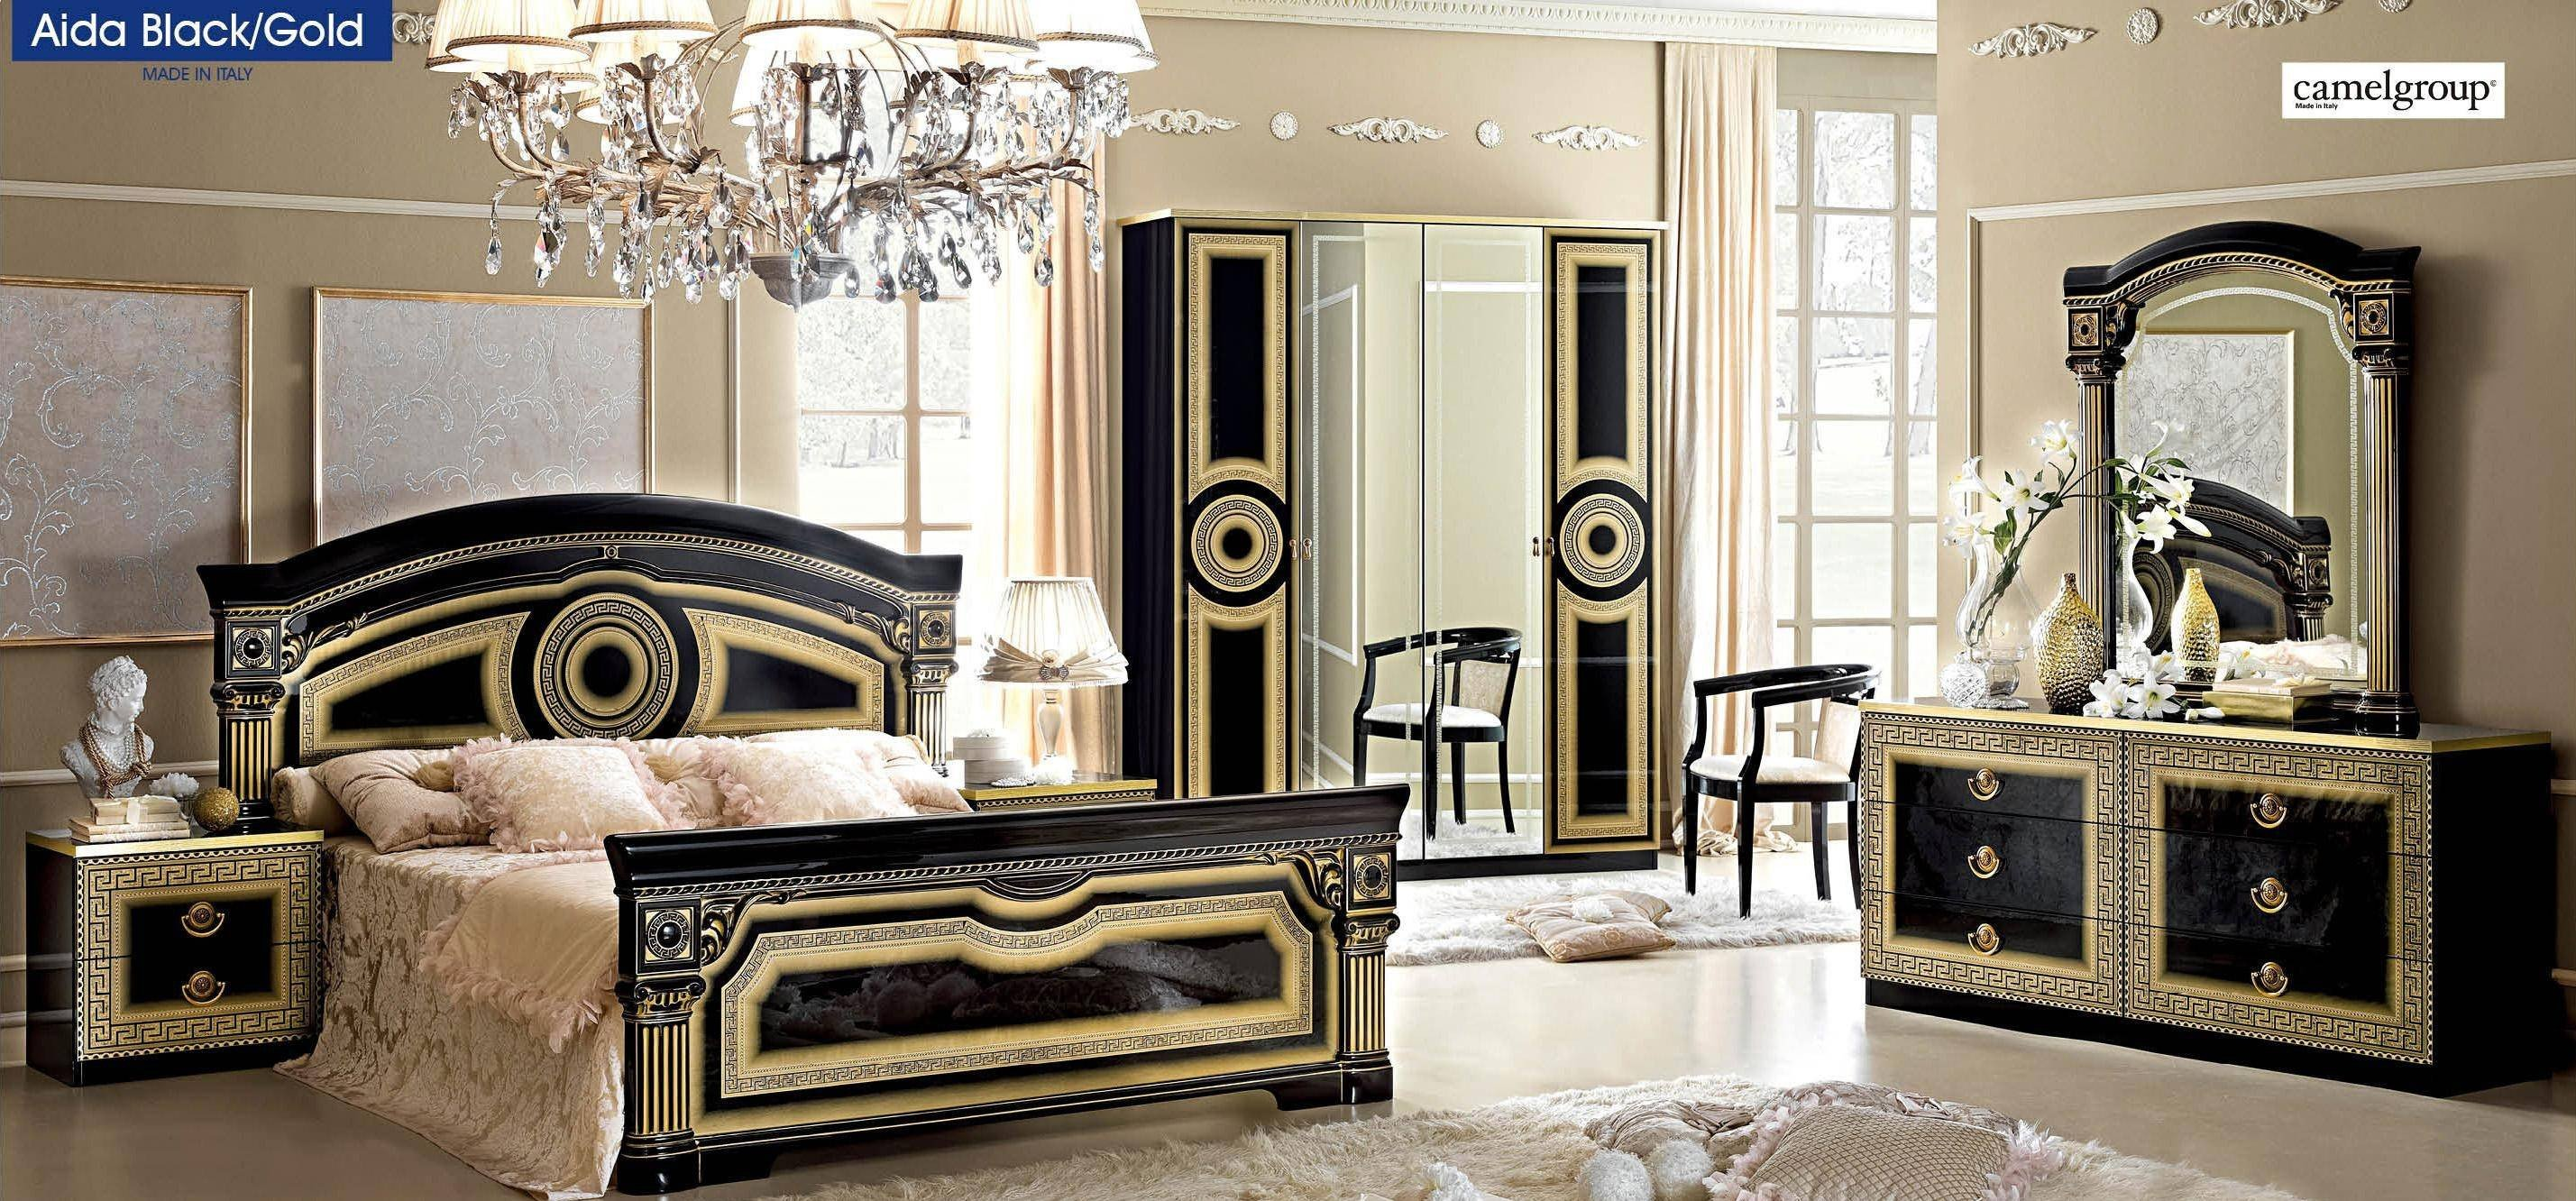 Classic Italian Bedroom Furniture Luxury Esf Aida Black Gold Lacquer Finish Queen Bedroom Set 5ps